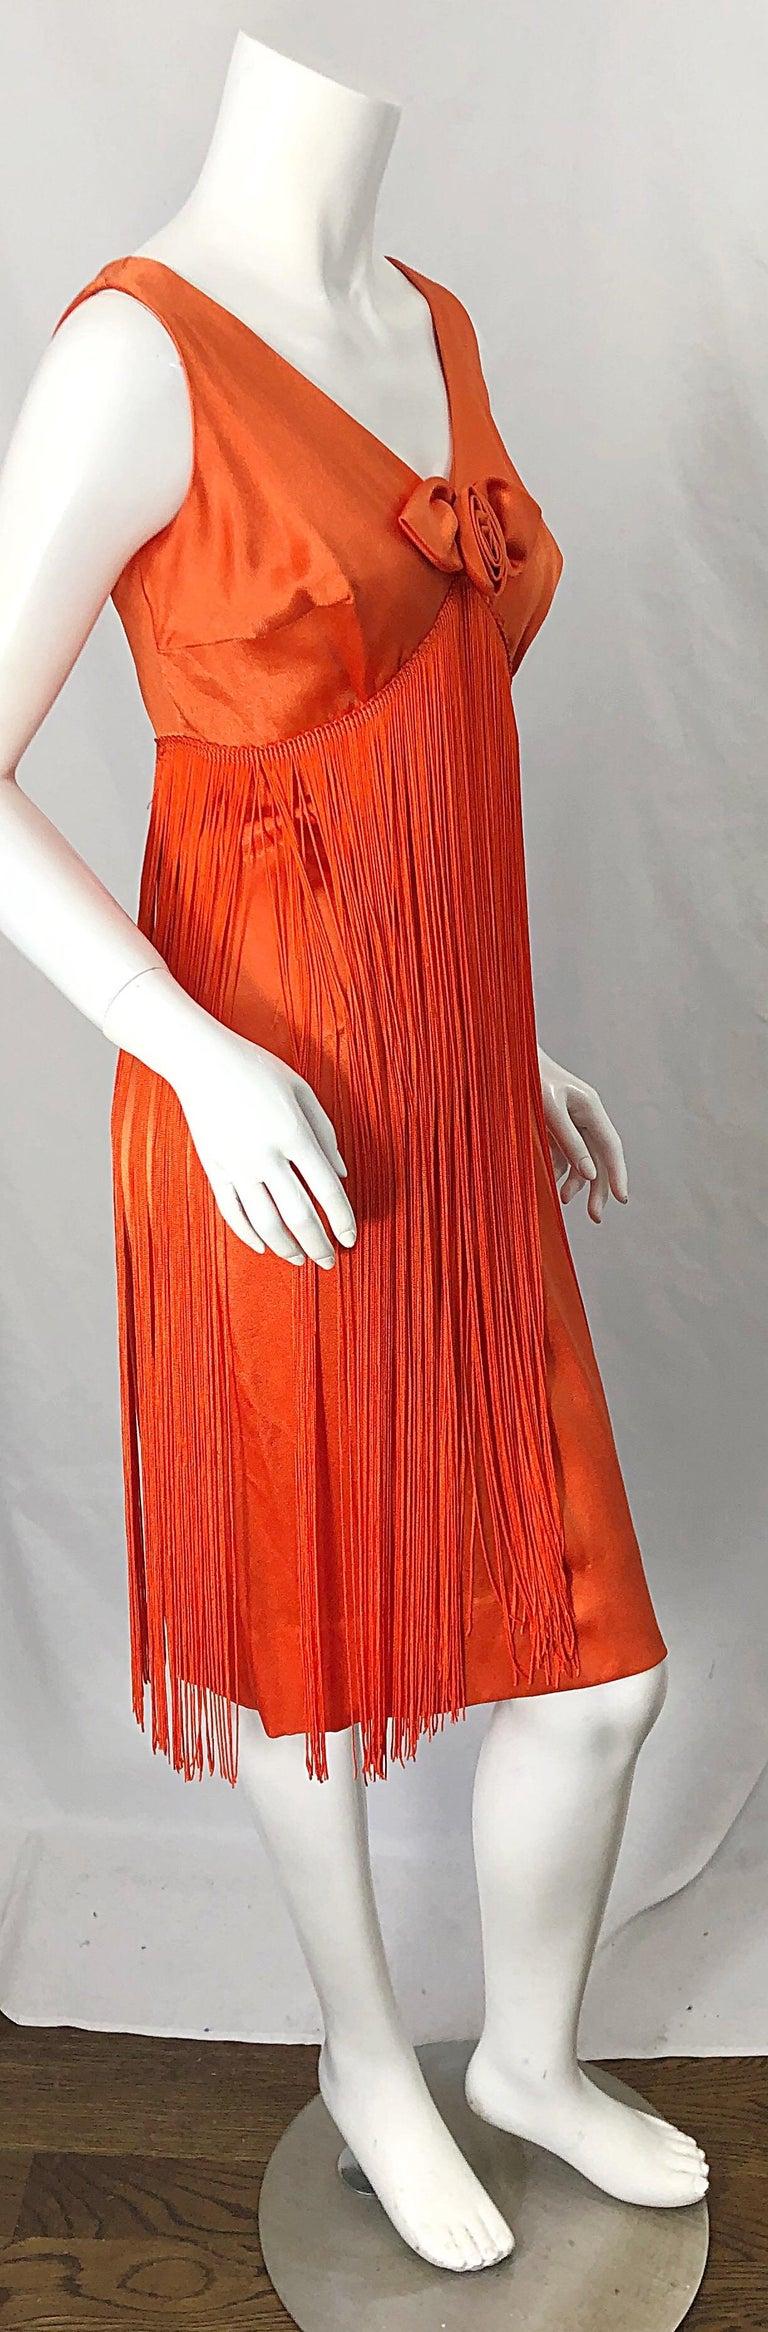 1960s Joseph Magnin Neon Orange Fully Fringed Vintage 60s Flapper Dress For Sale 1